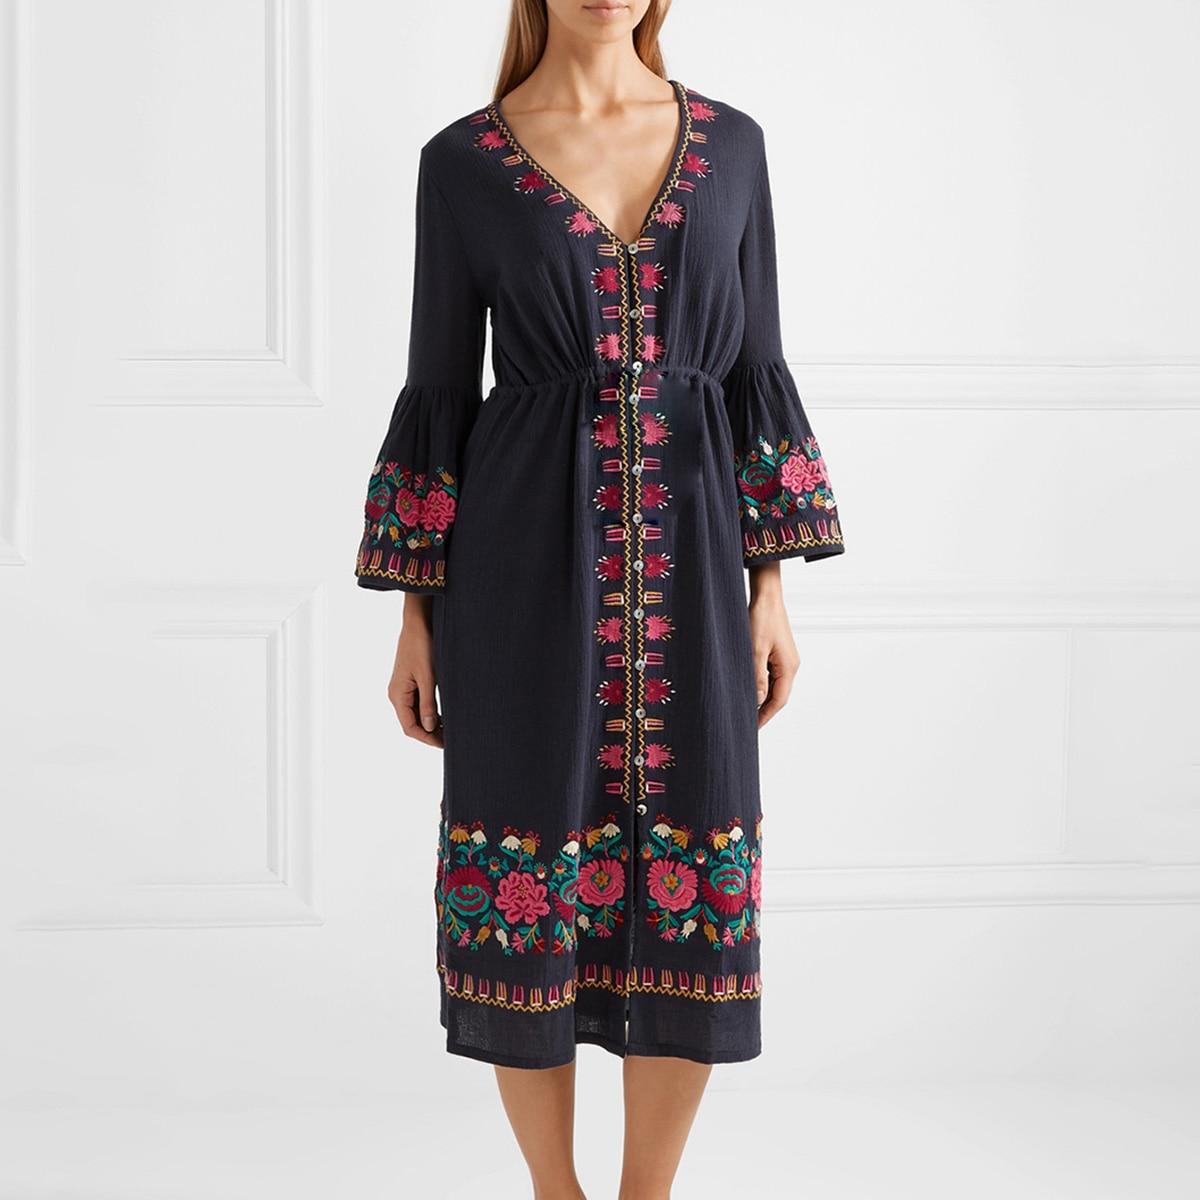 Jastie Floral Embroidered Cotton Midi Dress Elastic Elastic Waist Casual Women Dresses Boho Hippie Flare Sleeve